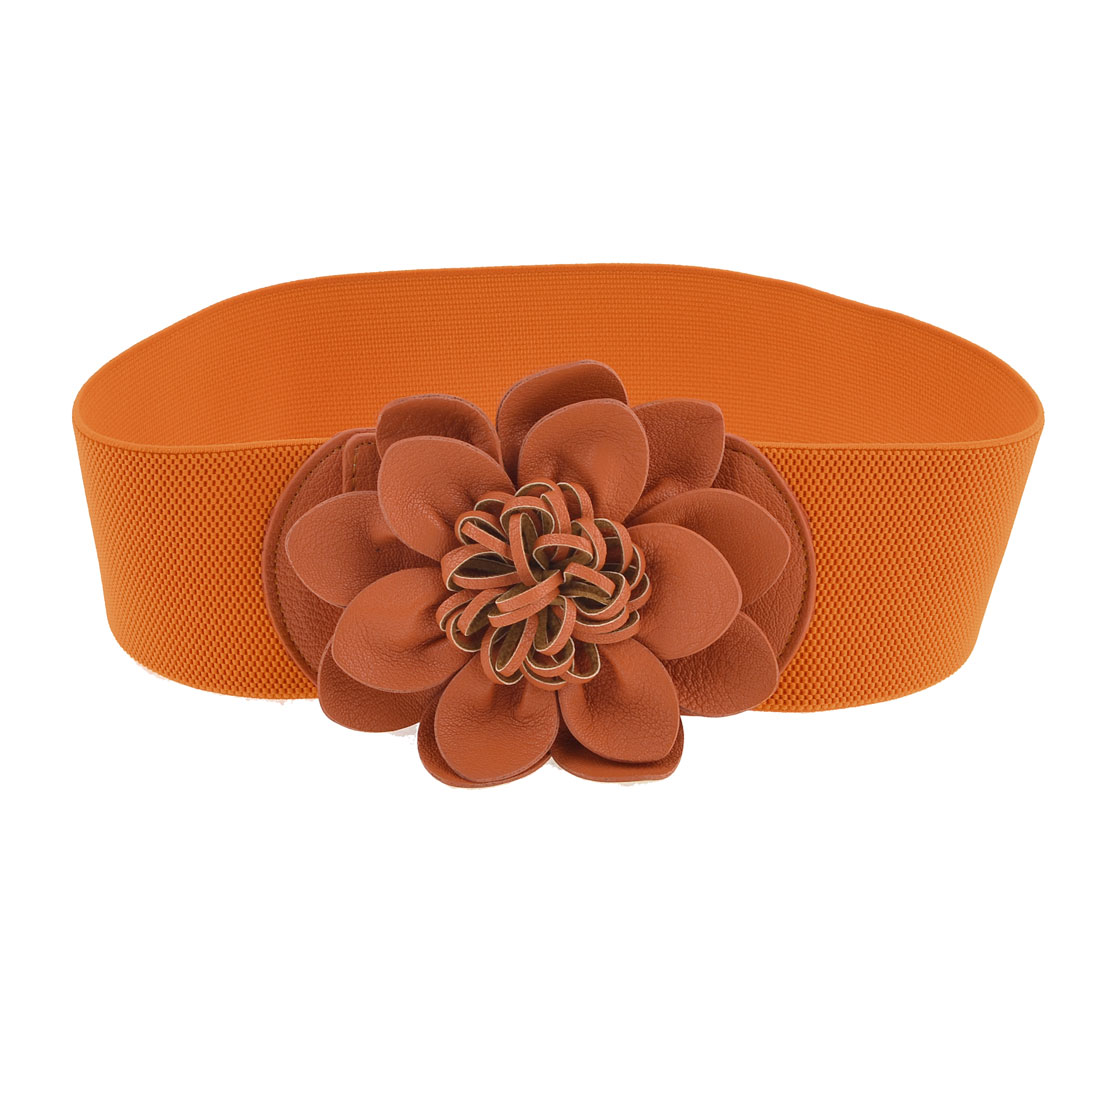 Ladies Press Stud Buckle Faux Leather Flower Accent Stretchy Waist Belt Orange